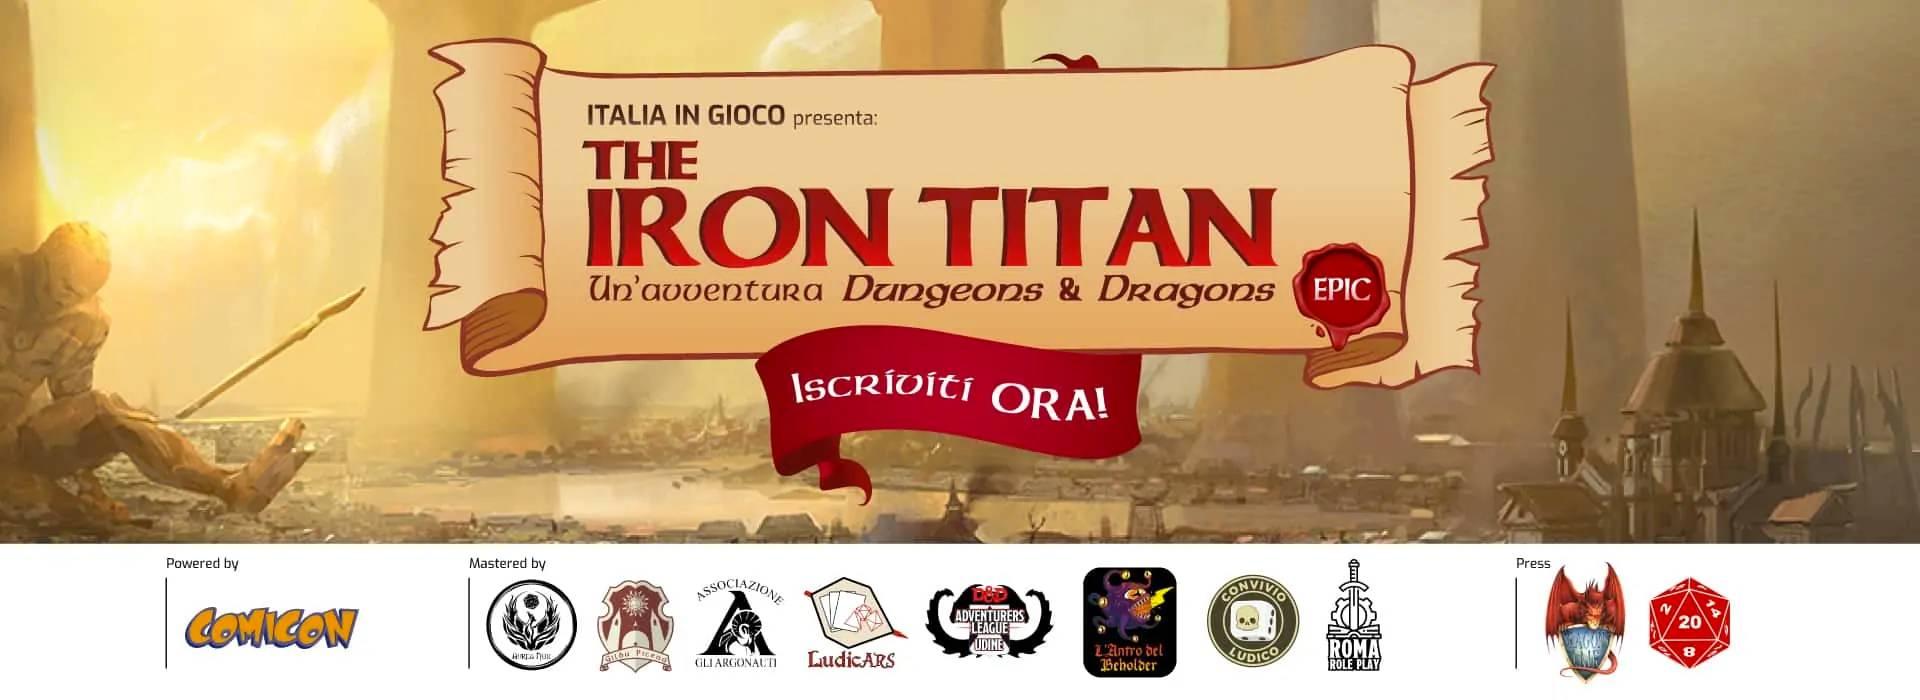 Dungeons & Dragons – The Iron Titan